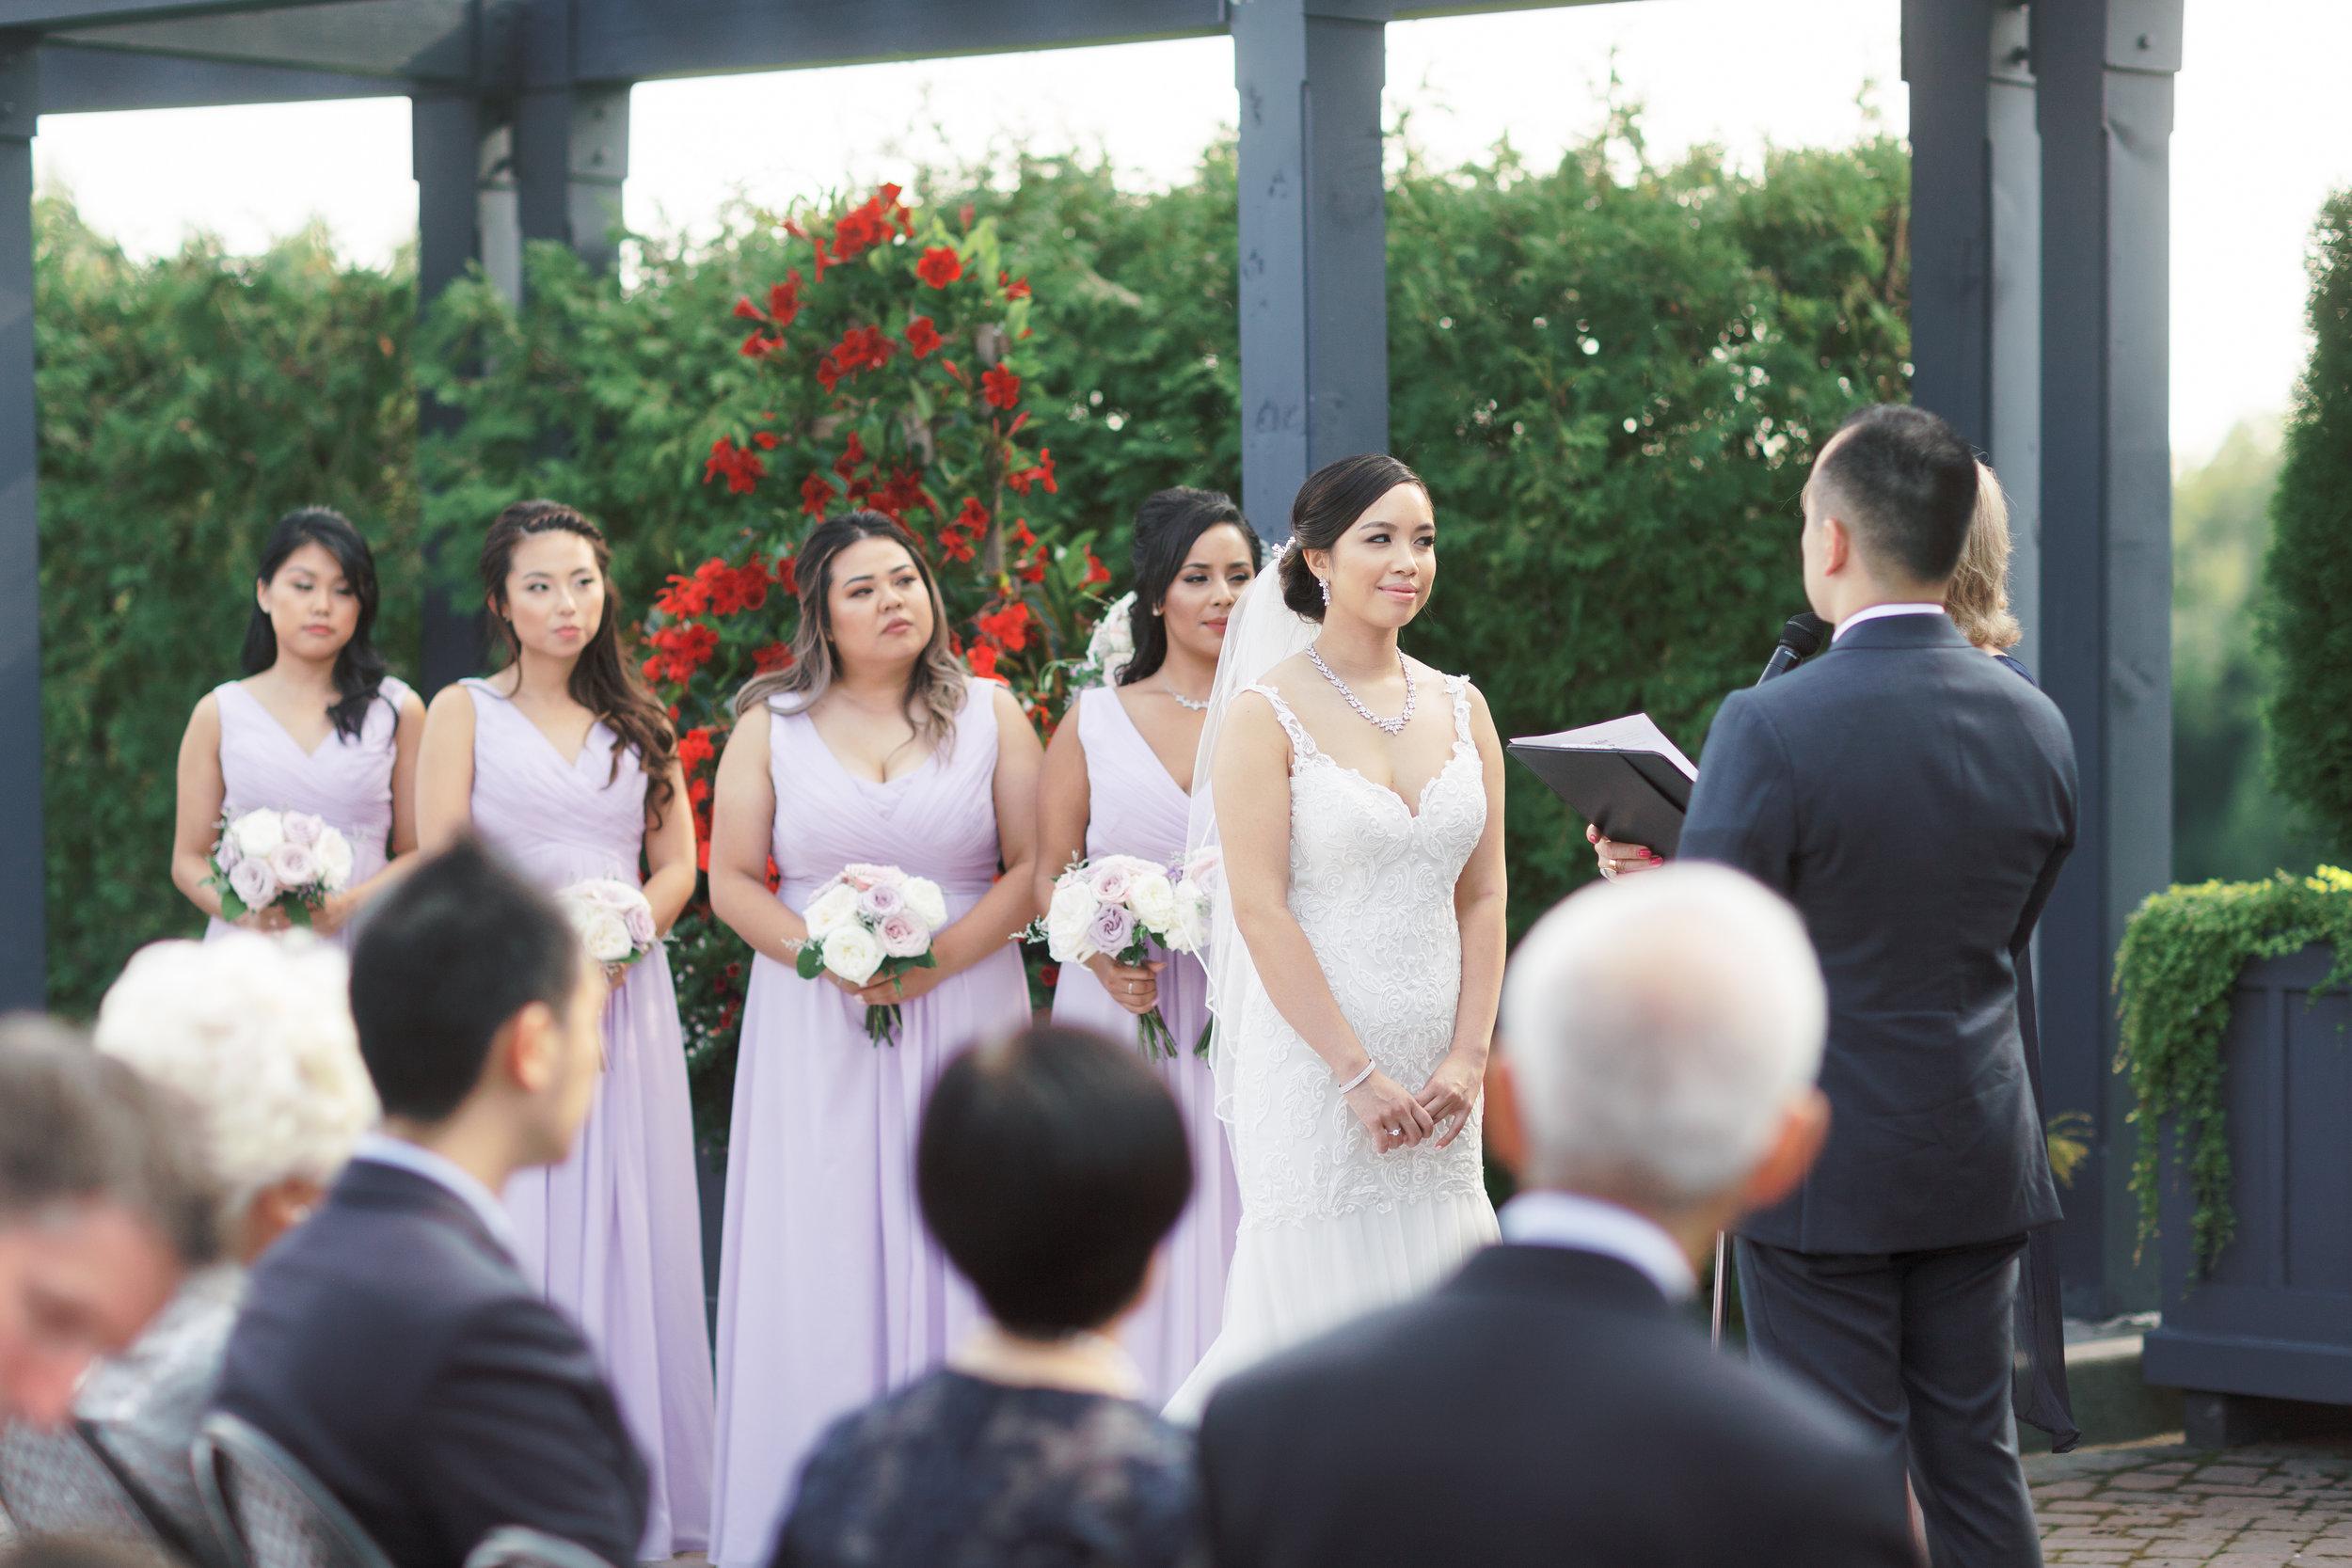 Angus Glen Wedding - Ceremony-49.jpg